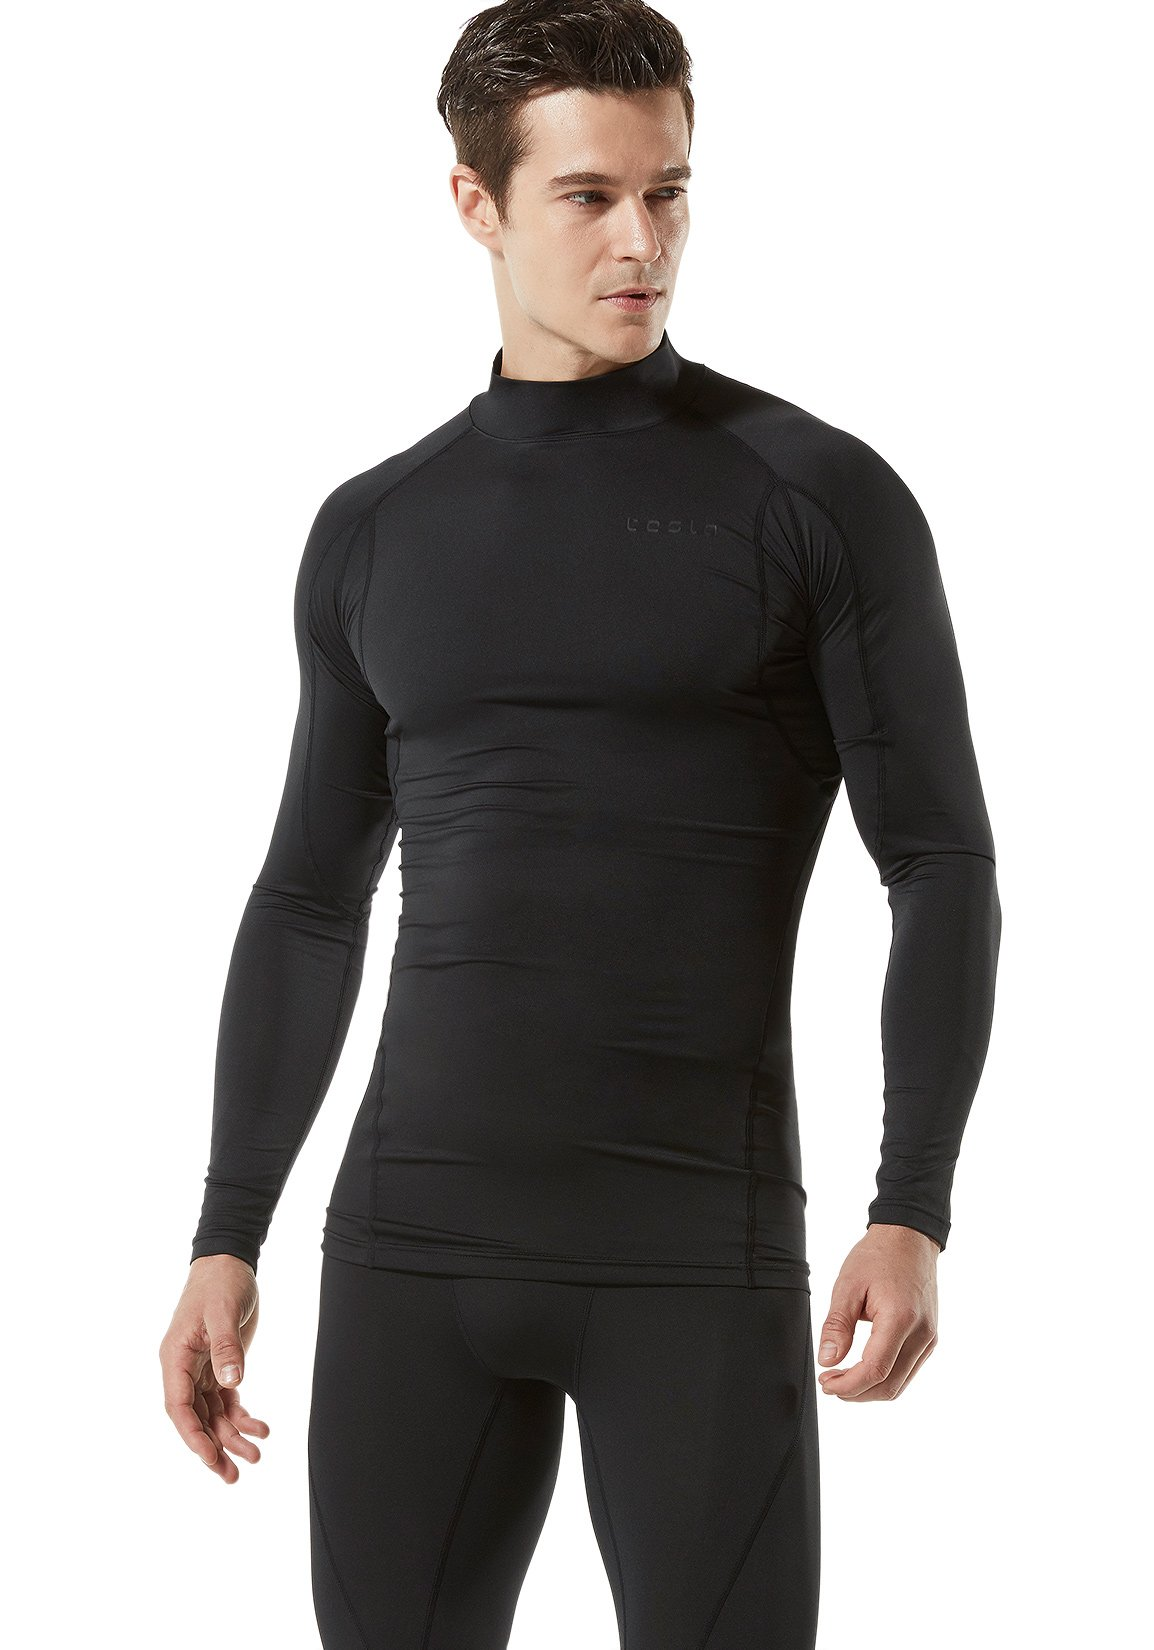 Tesla Men's Mock Long Sleeved T Shirt Cool Dry Compression Baselayer MUT12/T11/T01